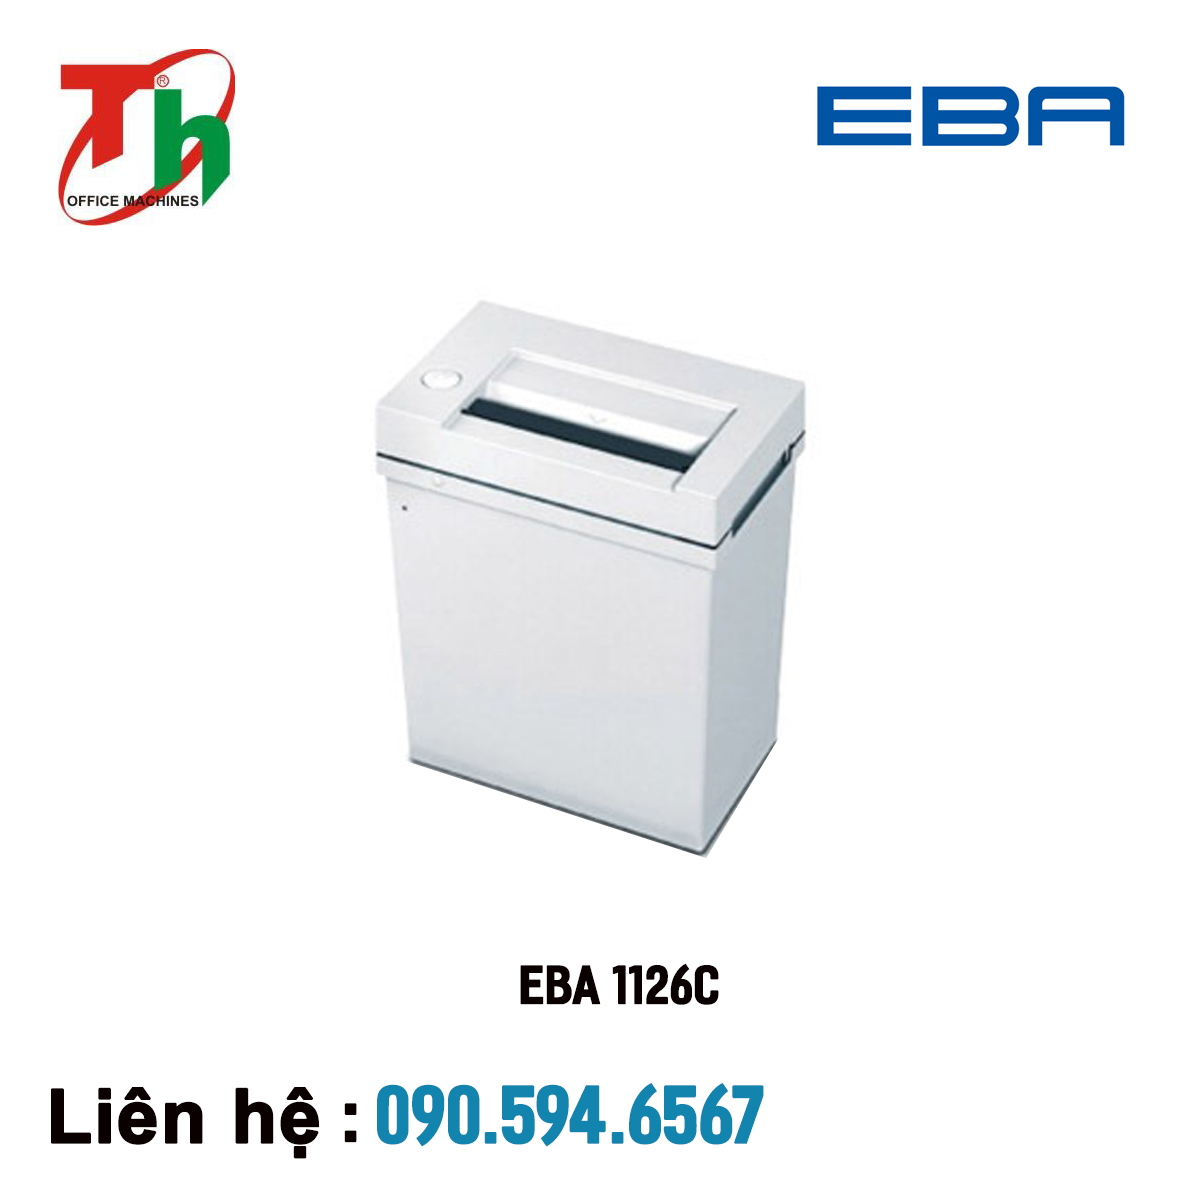 Máy hủy giấy EBA 1126C